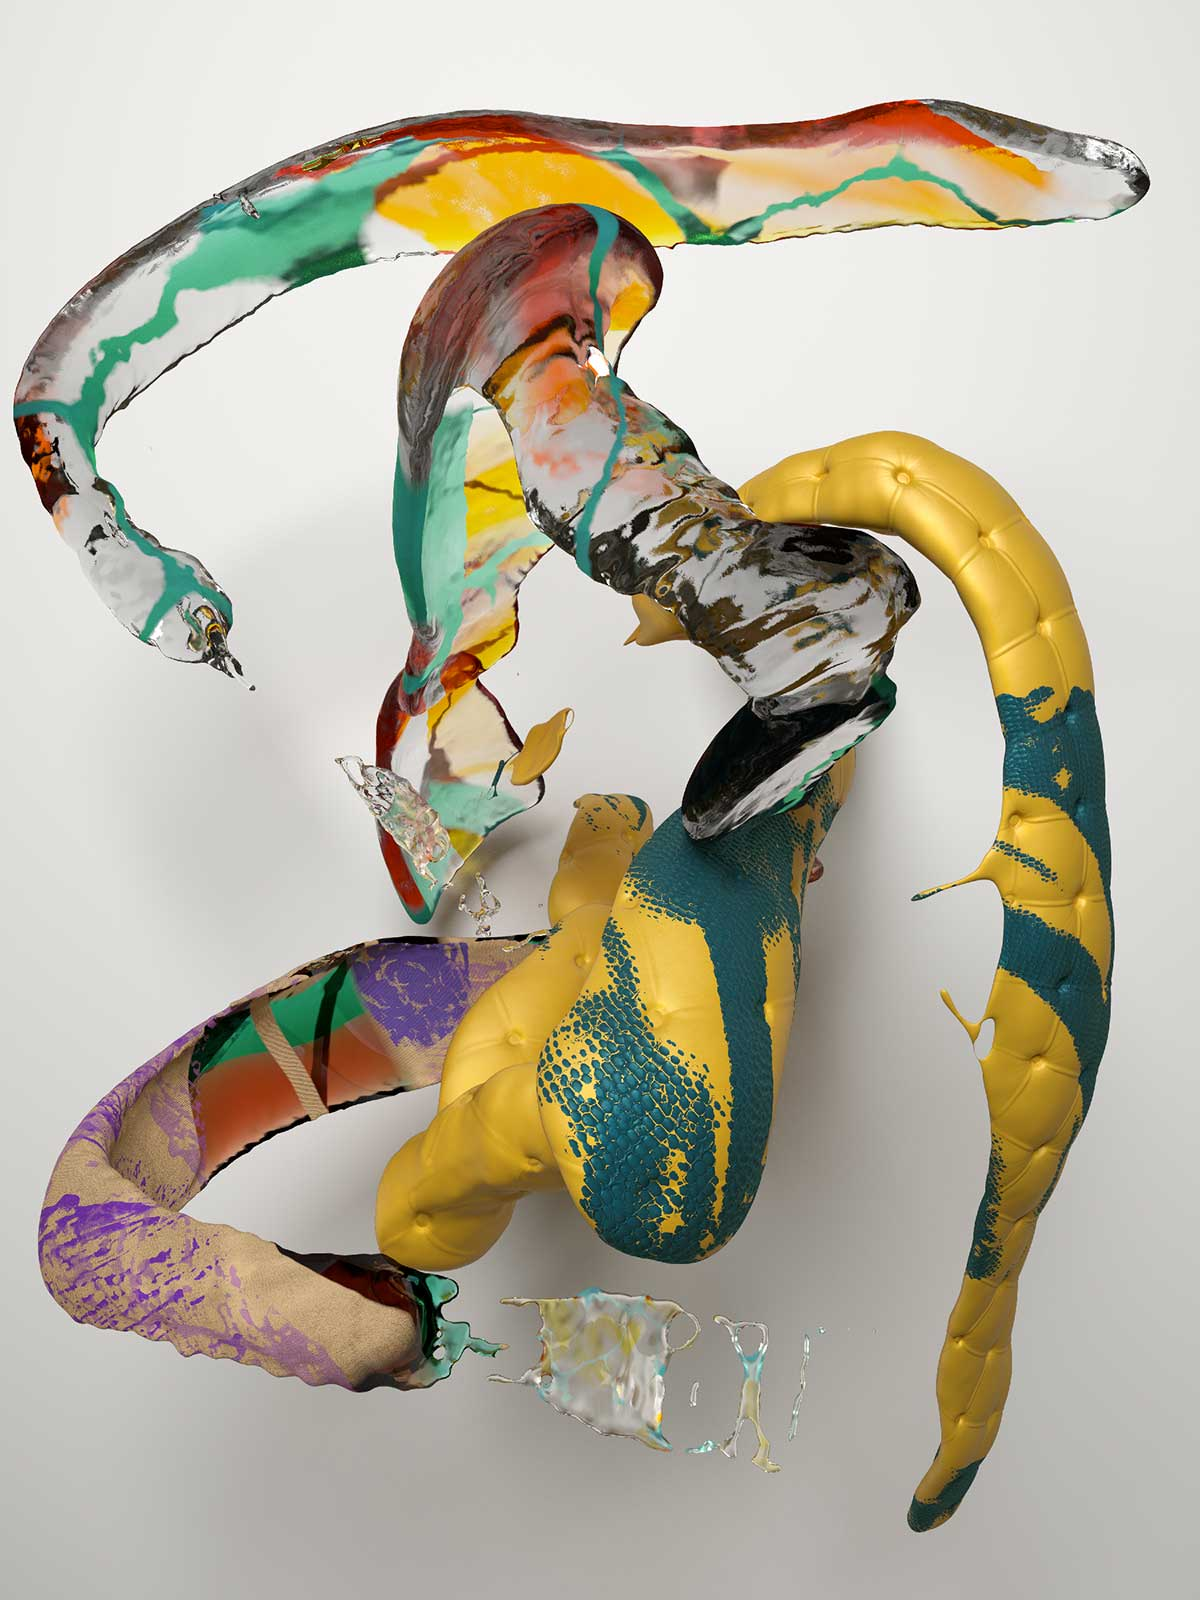 Substance I 02, CGI Fine Art Print, 140 x 105 cm, 2017